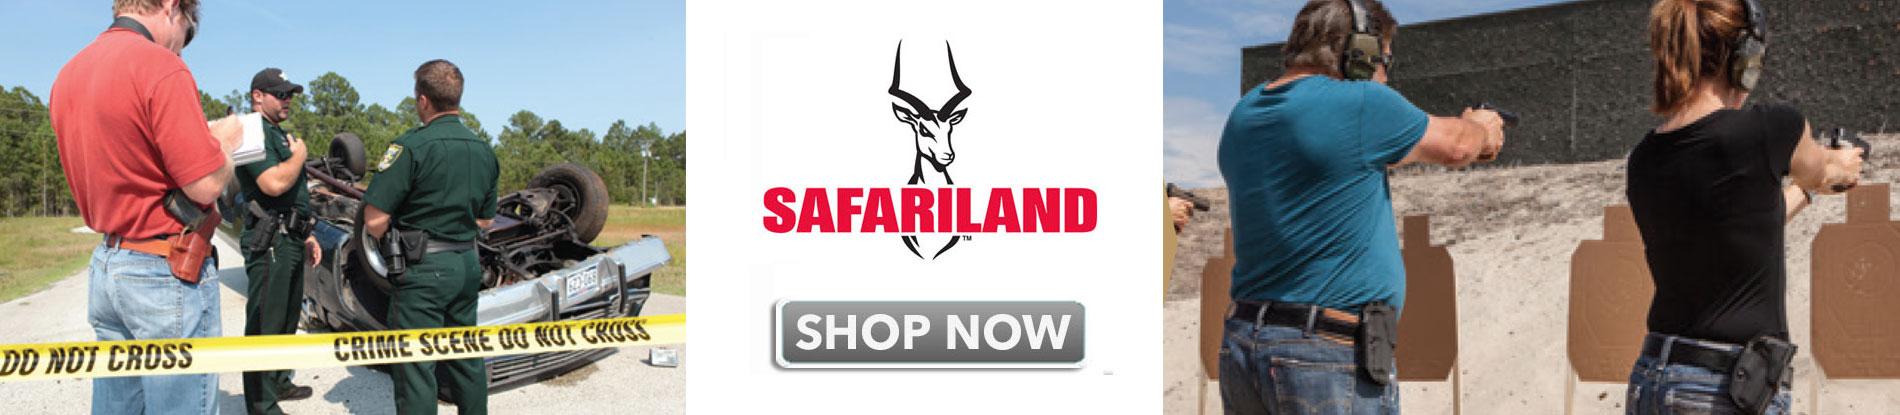 carousel_safariland_new191039.jpg